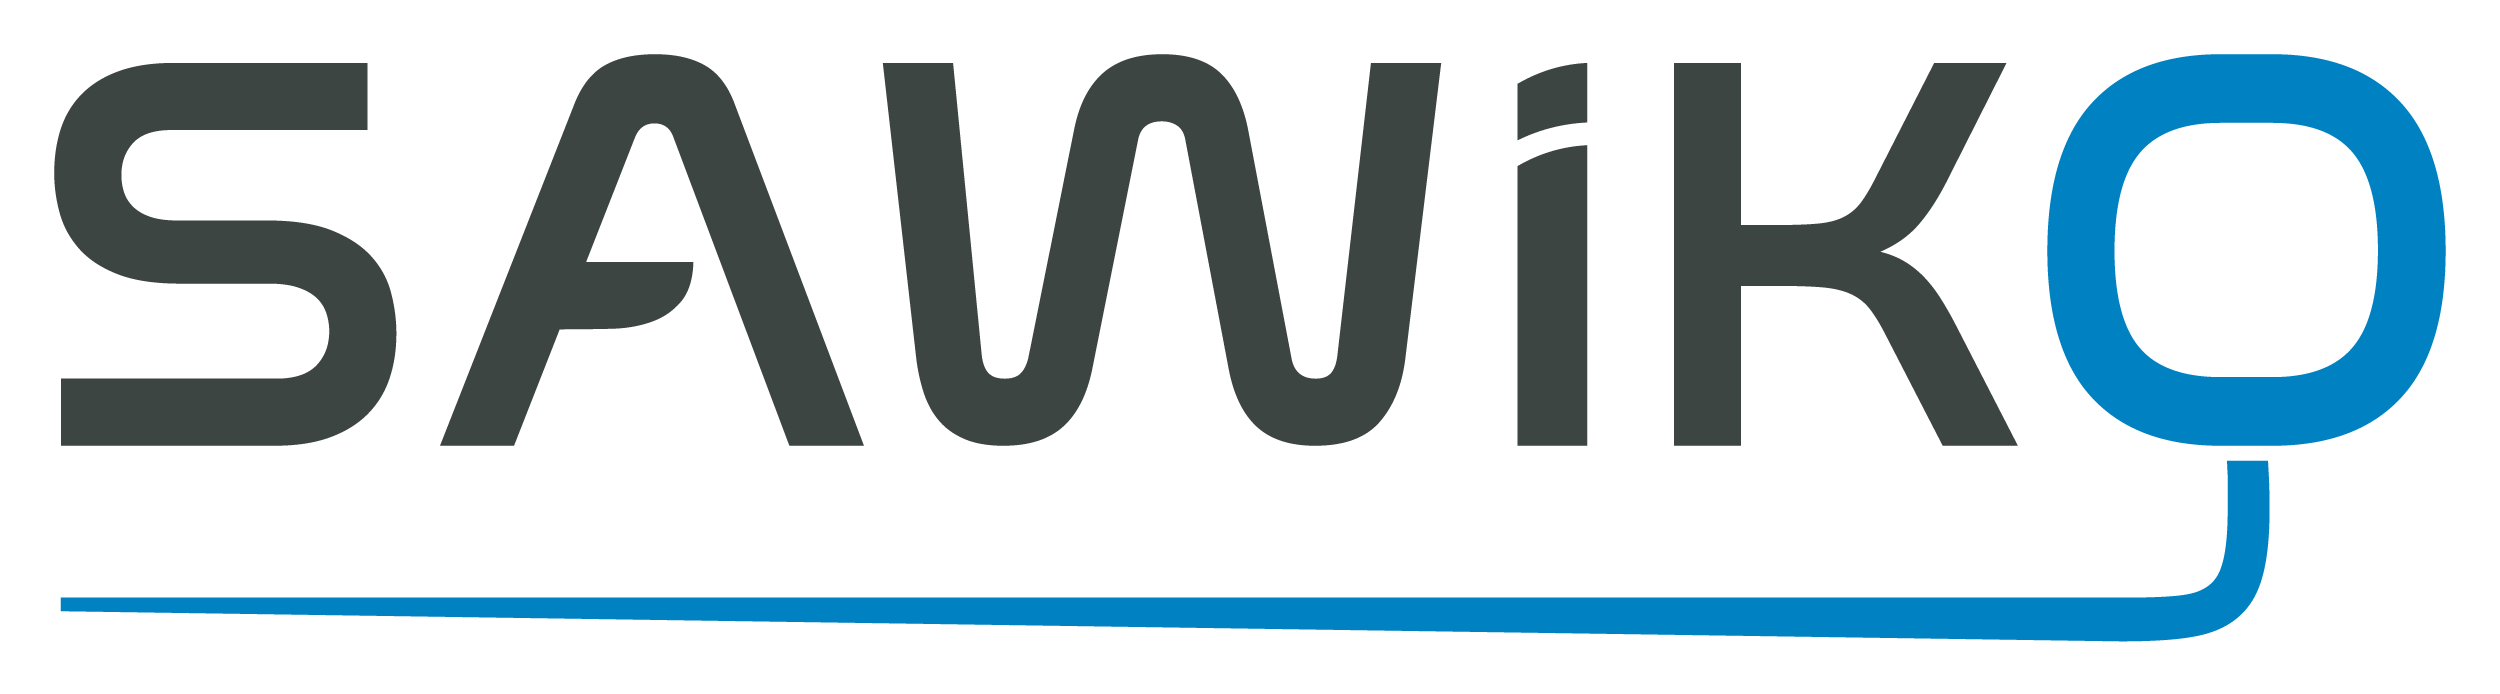 Nouveau logo Sawiko, fabricant d'attaches-remorques pour camping-cars et fourgons